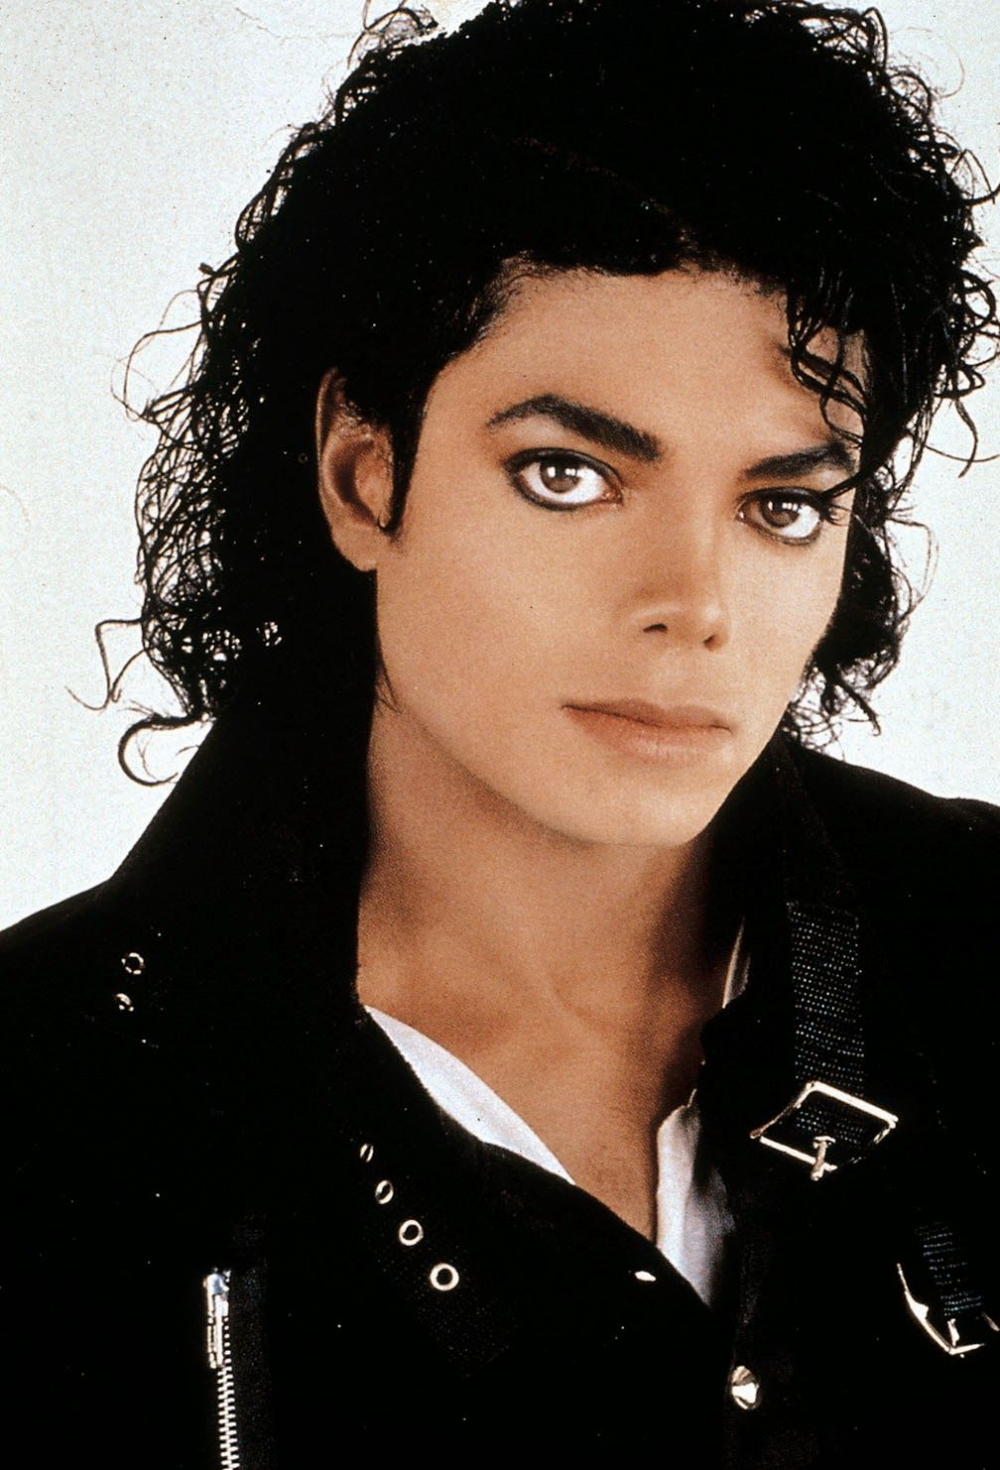 Michael Jackson Poster Culture Posters Michael Jackson Poster Michael Jackson Bad Michael Jackson Wallpaper